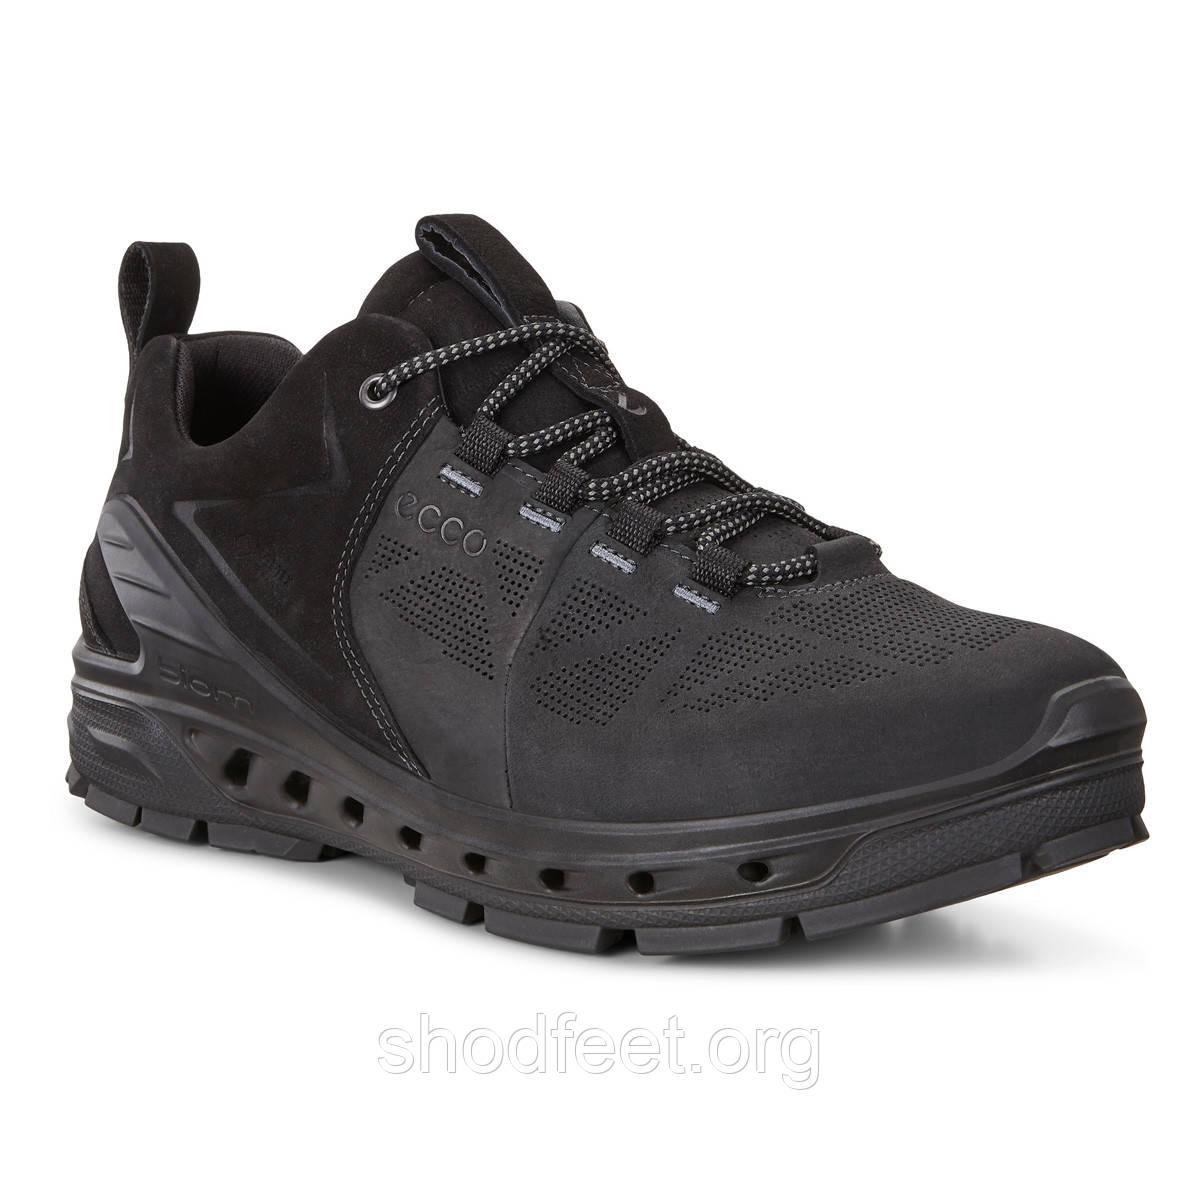 Мужские полуботинки Ecco Biom Venture Gore-Tex 854674-51052